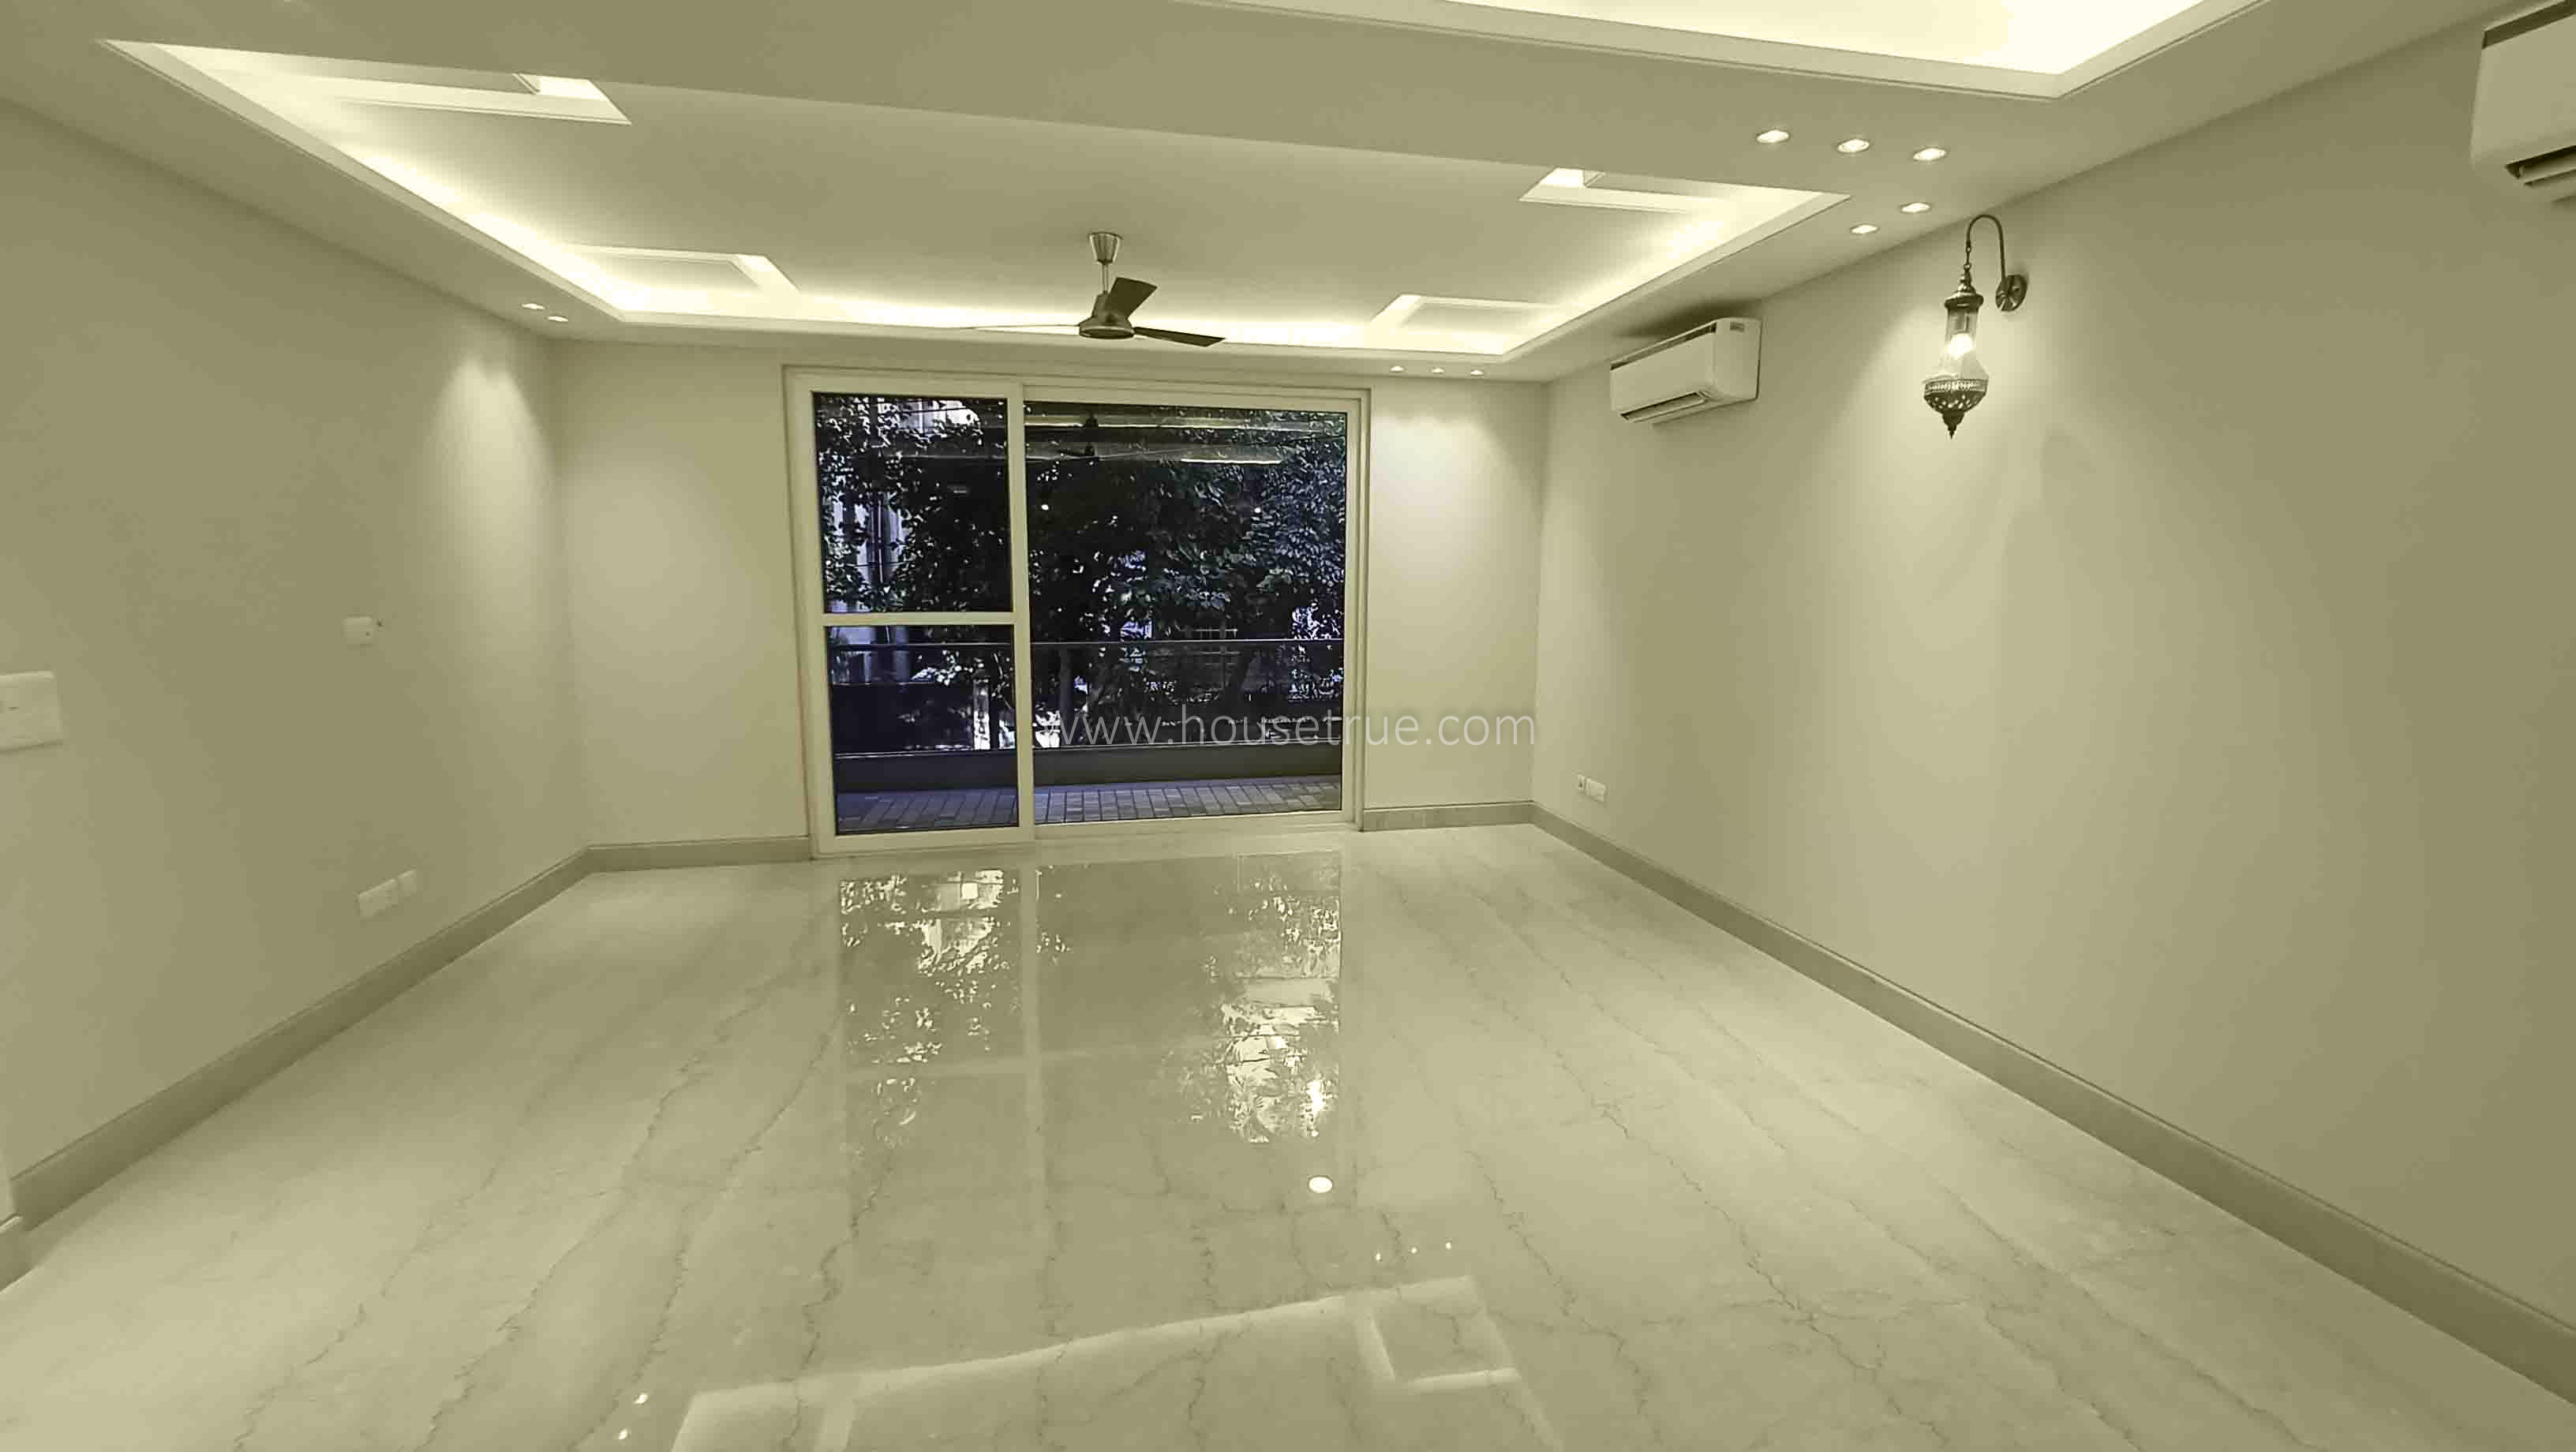 Unfurnished-Apartment-Gulmohar-Park-New-Delhi-26228